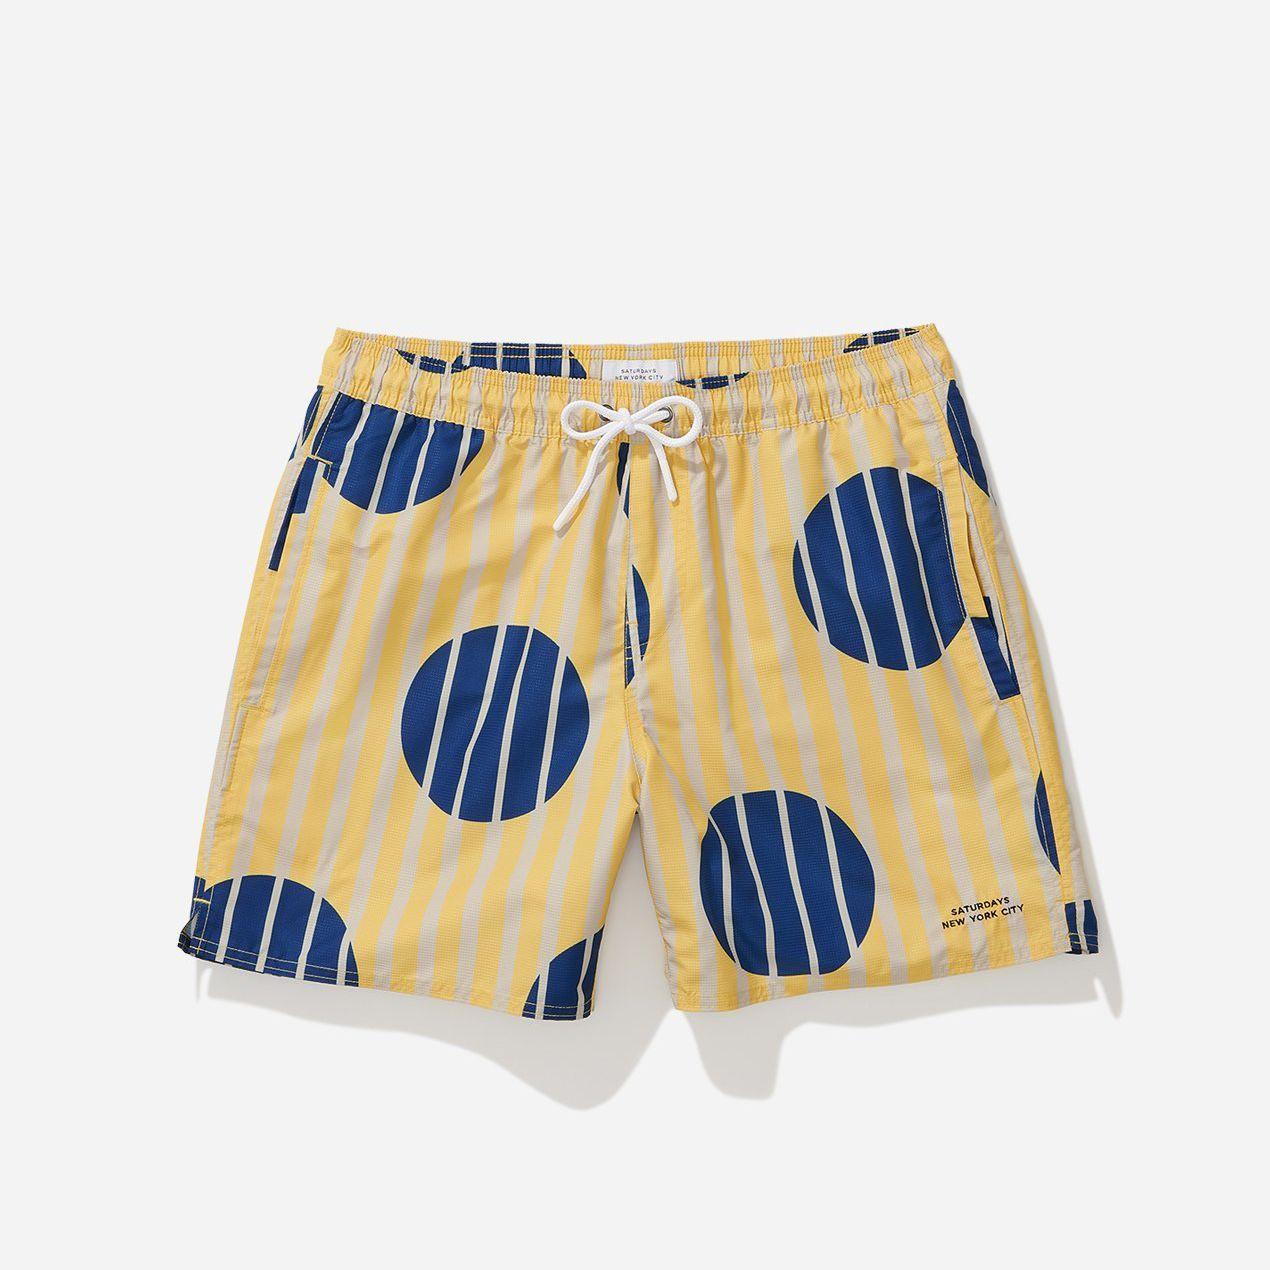 Timothy Striped Polka Dot Swim Short